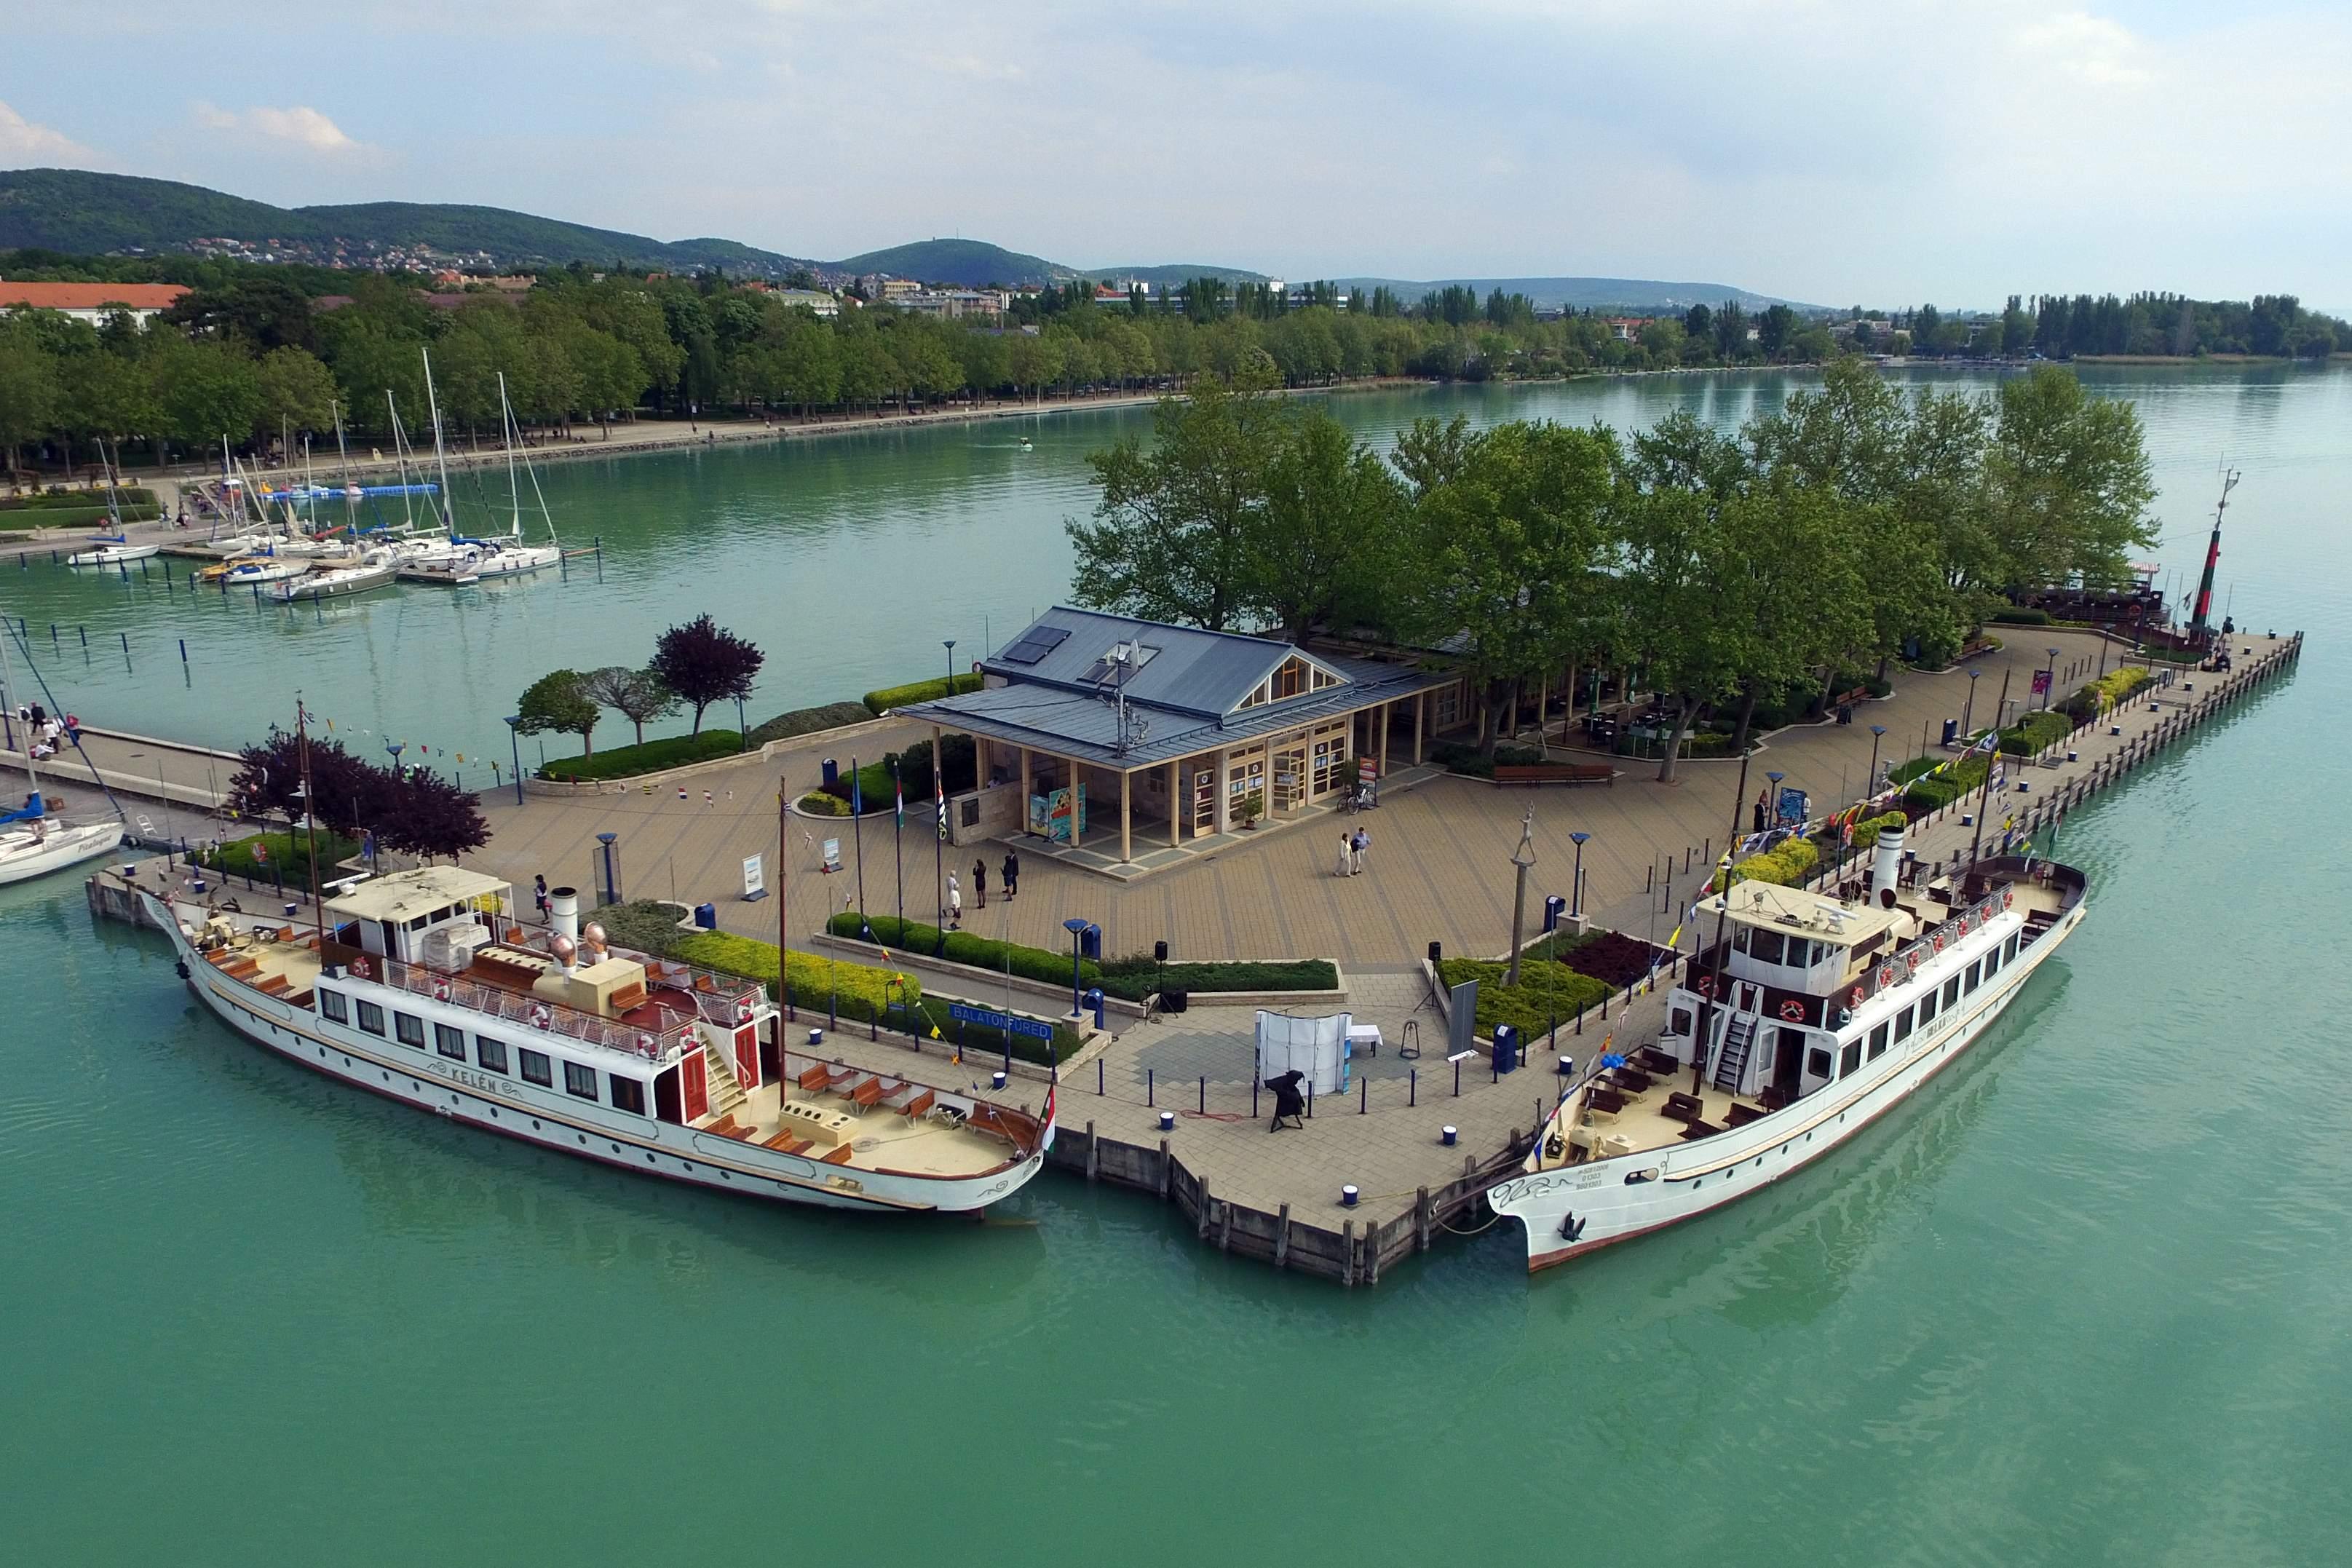 Blatonfüred kikötő Zátonyi Gergely (1)